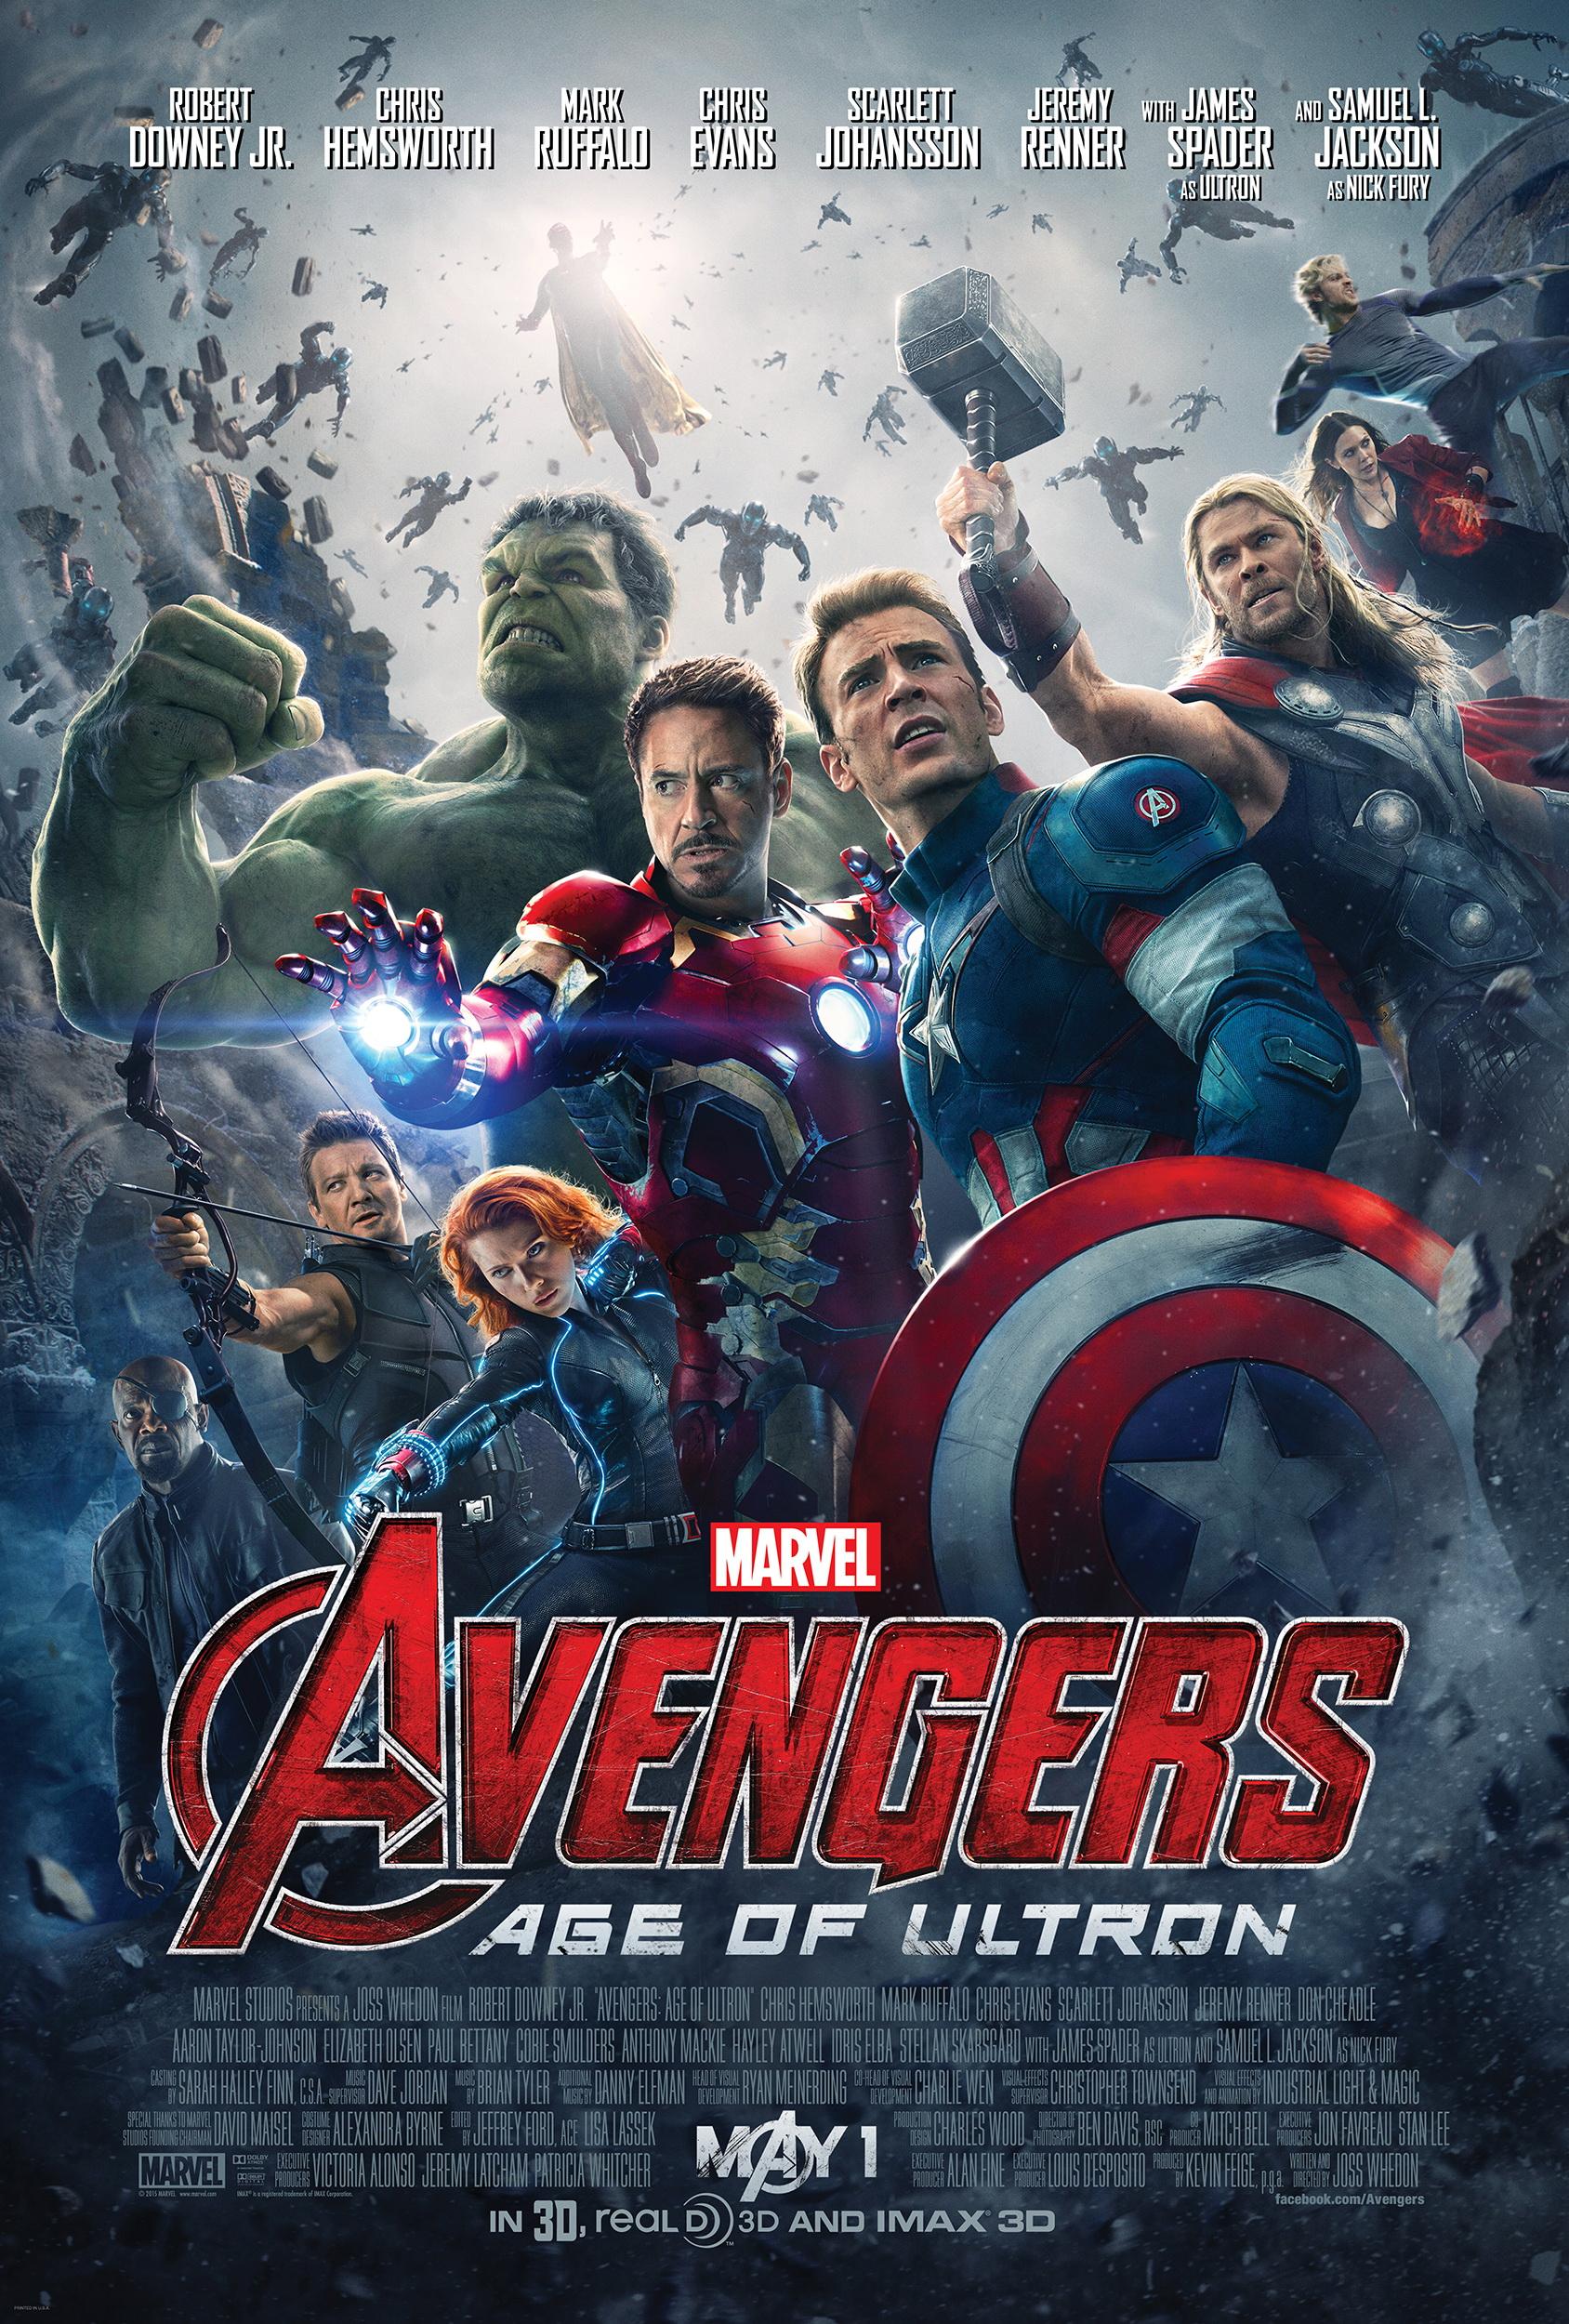 e3f7b5e1ac3 Avengers: Age of Ultron   Iron Man Wiki   FANDOM powered by Wikia